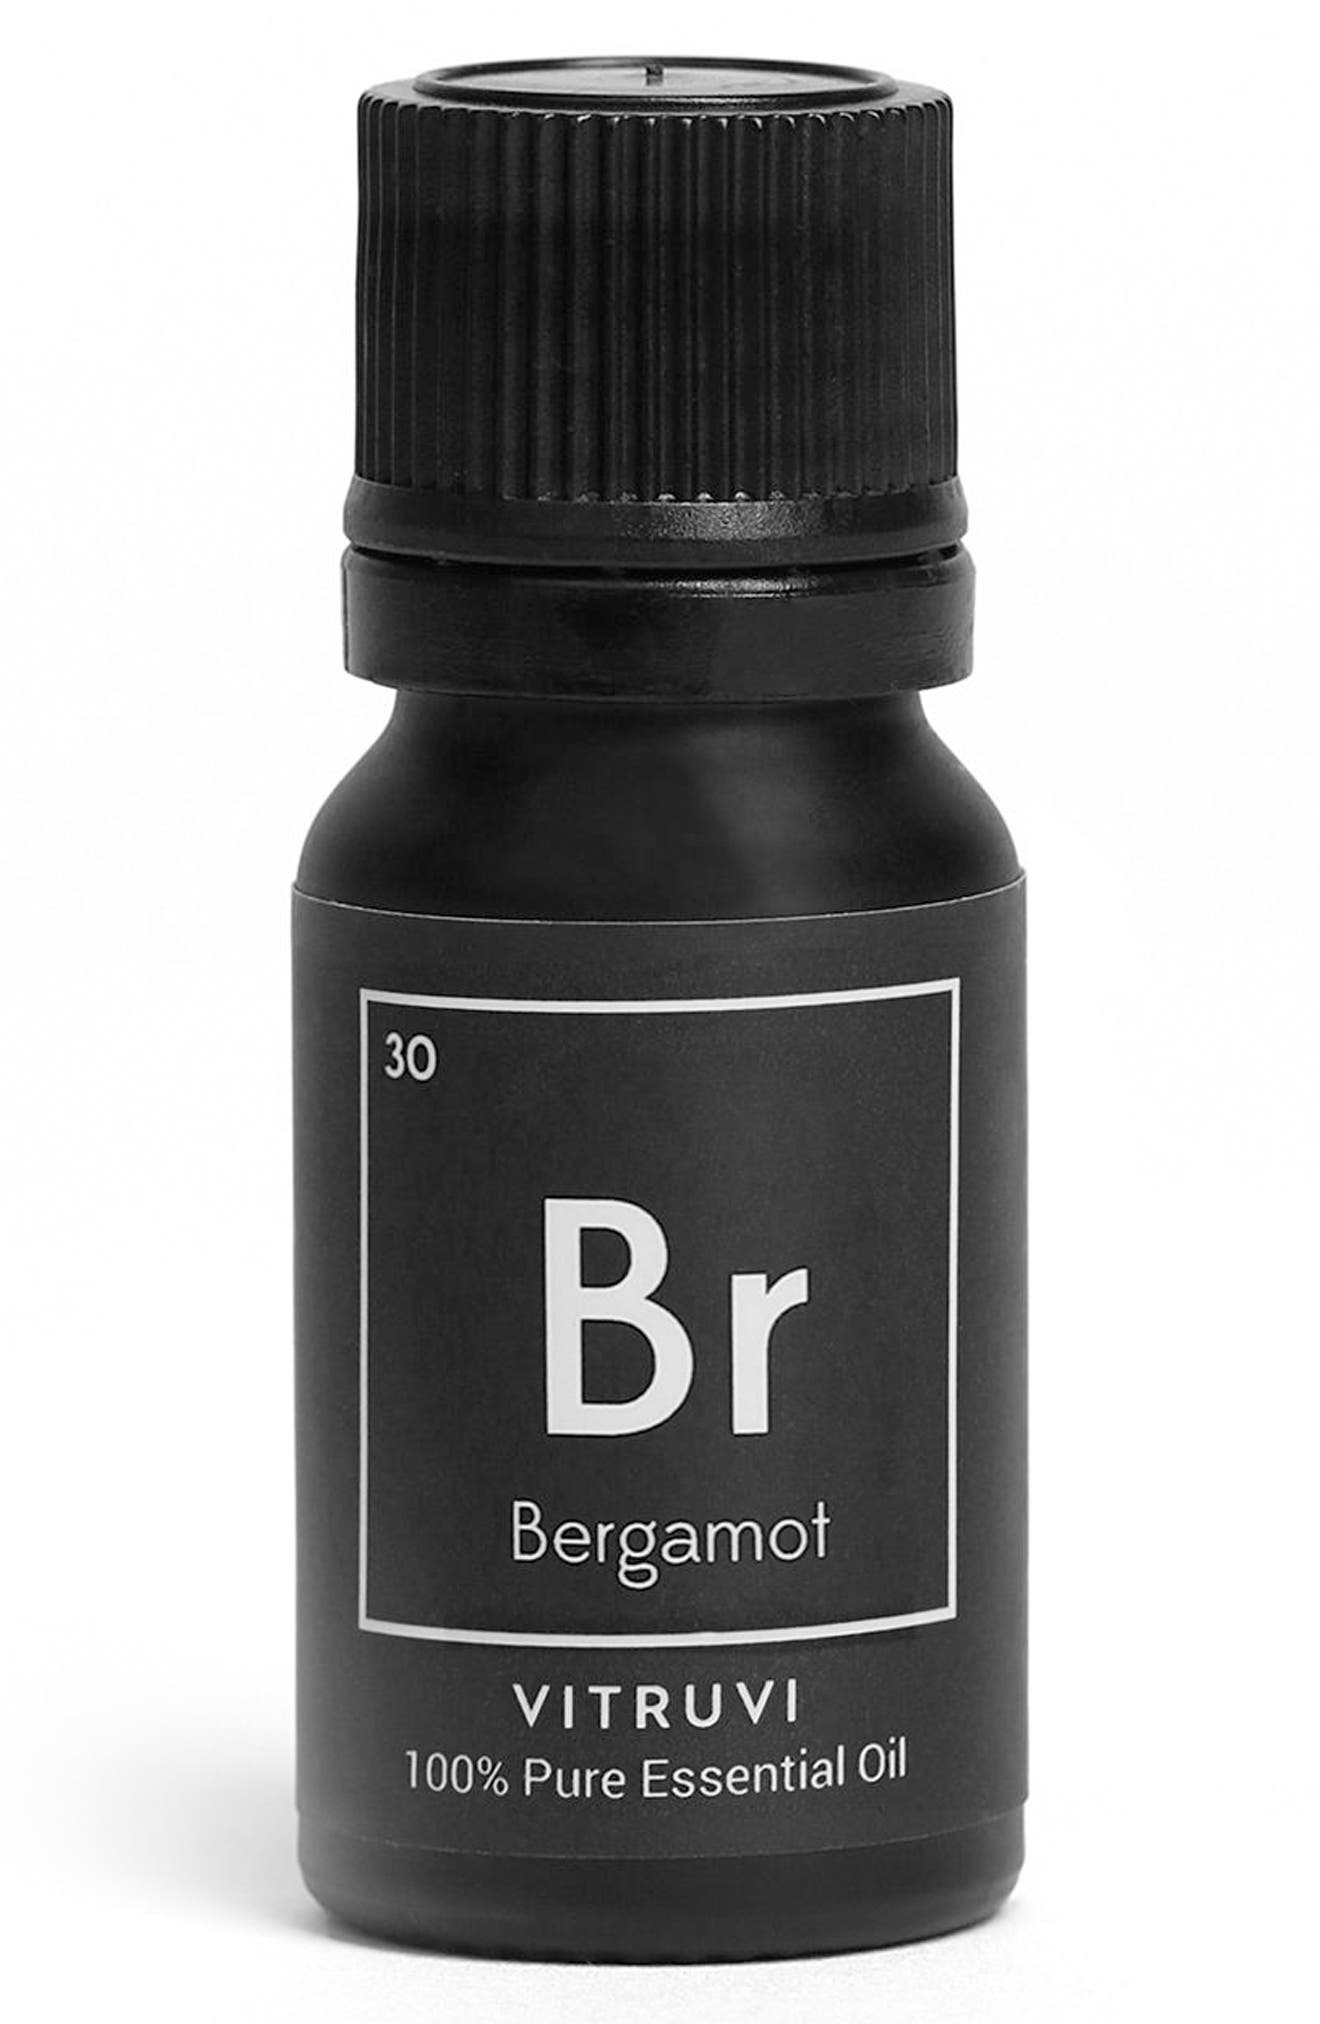 Main Image - Vitruvi Bergamot Essential Oil